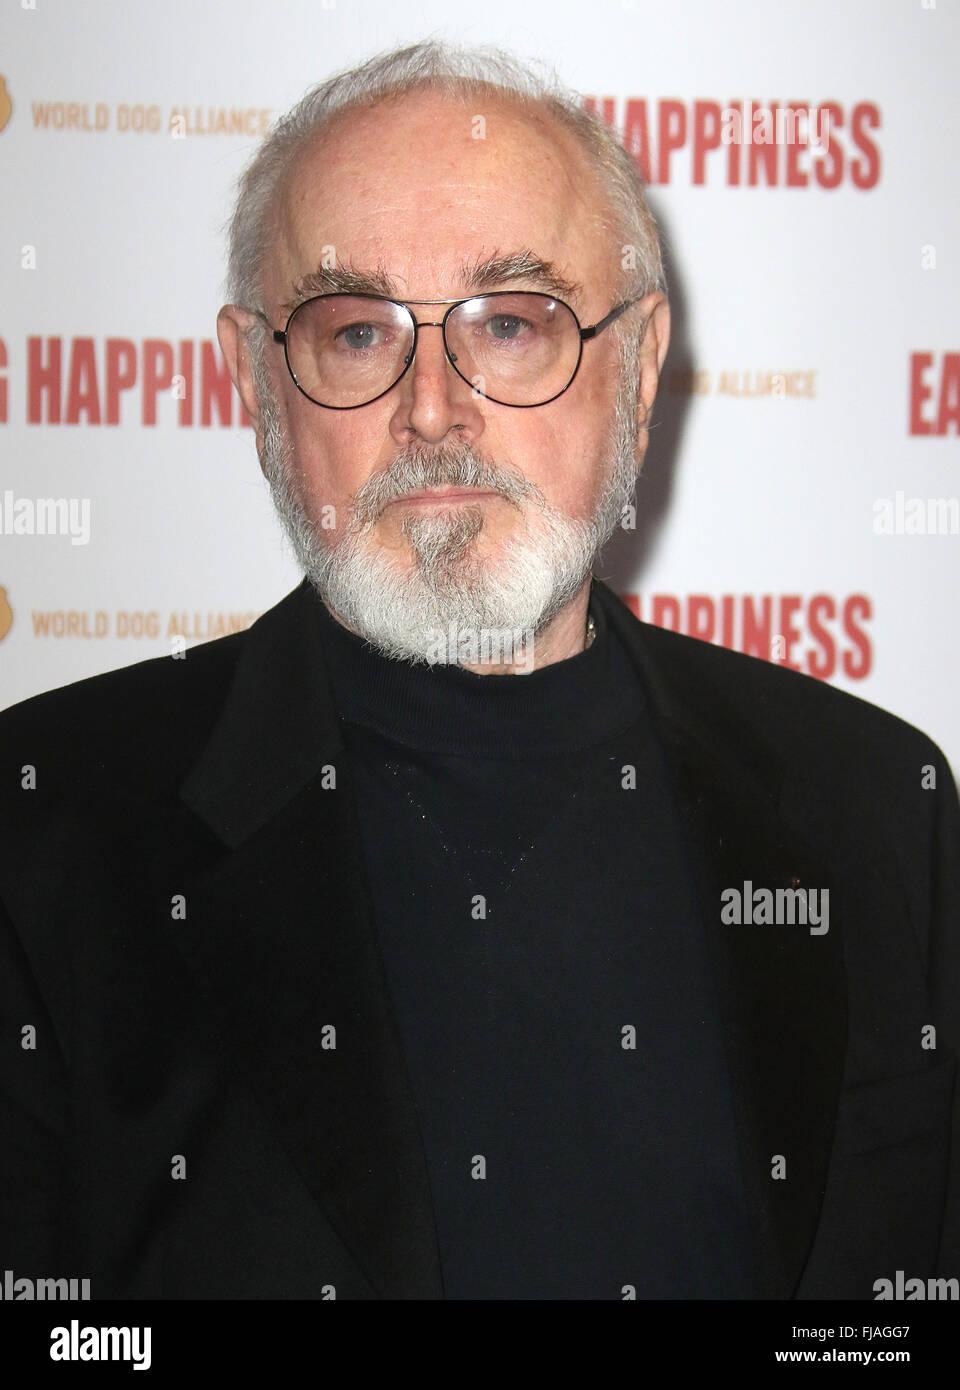 Jan 25, 2016 - London, England, UK - Peter Egan attending 'Eating Happiness' - VIP screening at the Mondrian - Stock Image